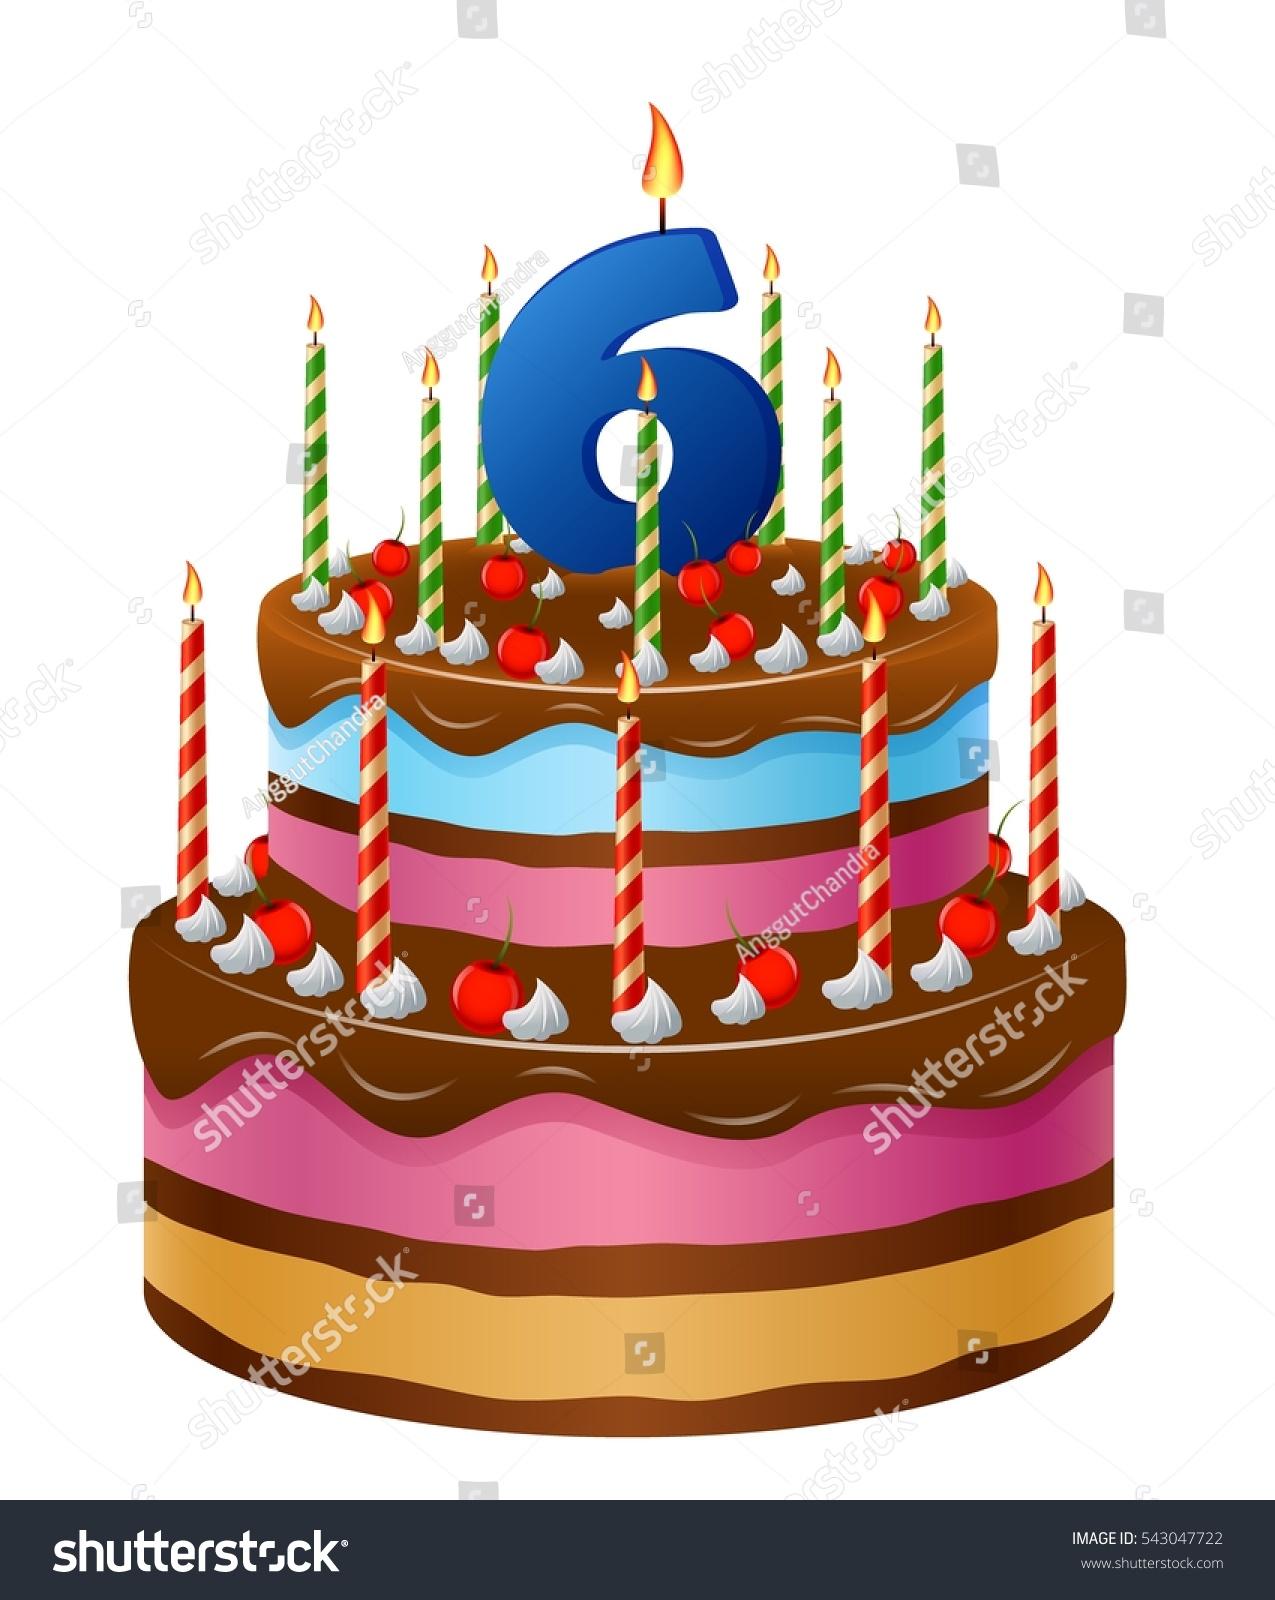 Royalty Free Stock Illustration Of Happy Birthday Cake 6 Stock